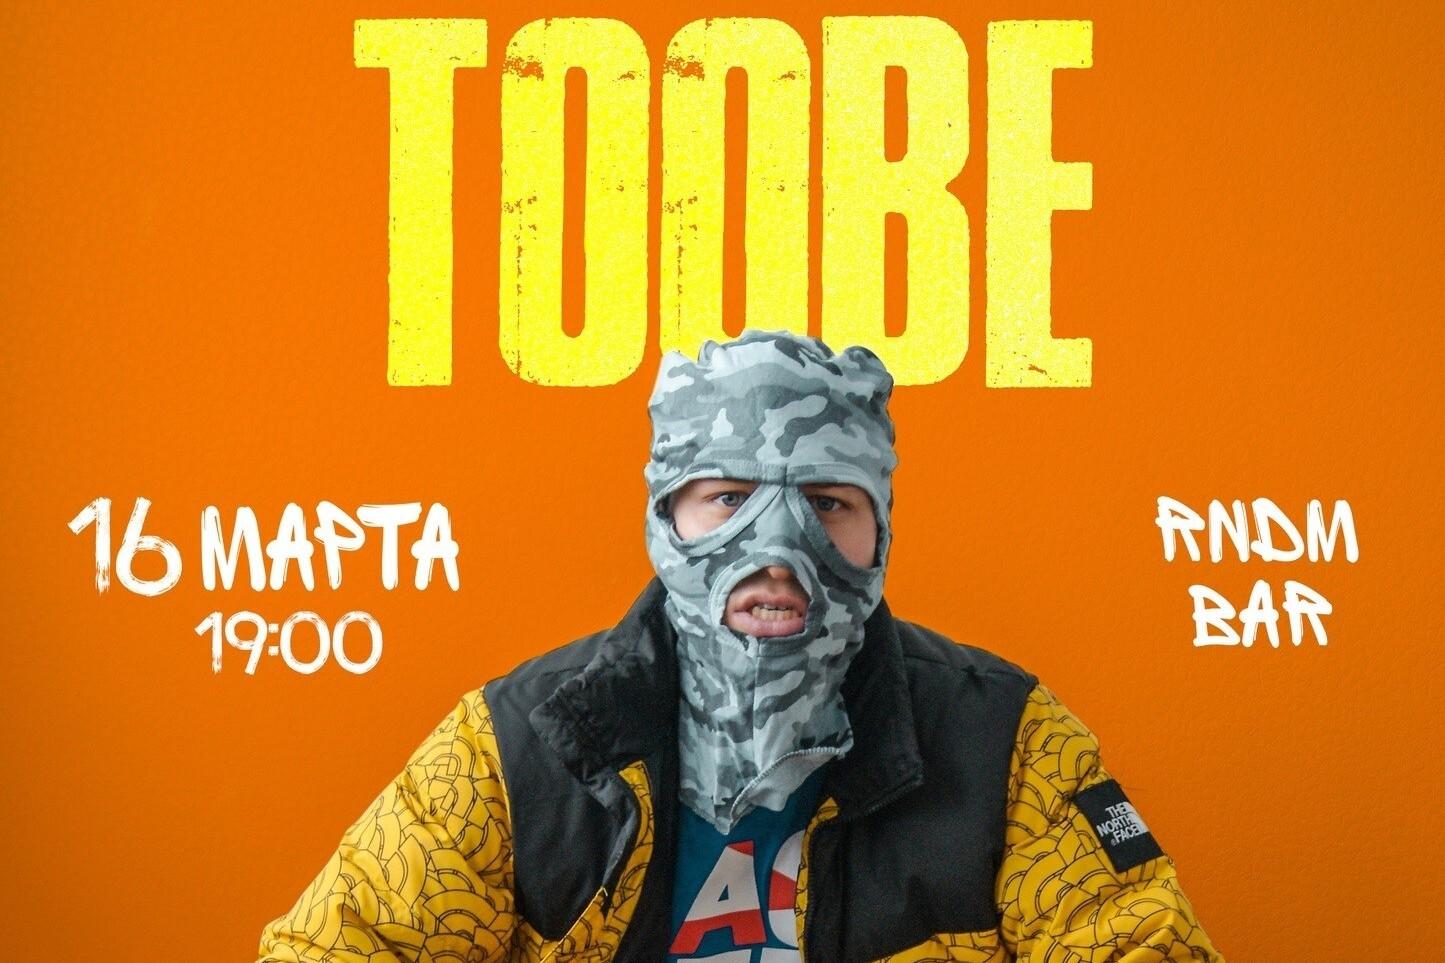 Toobe